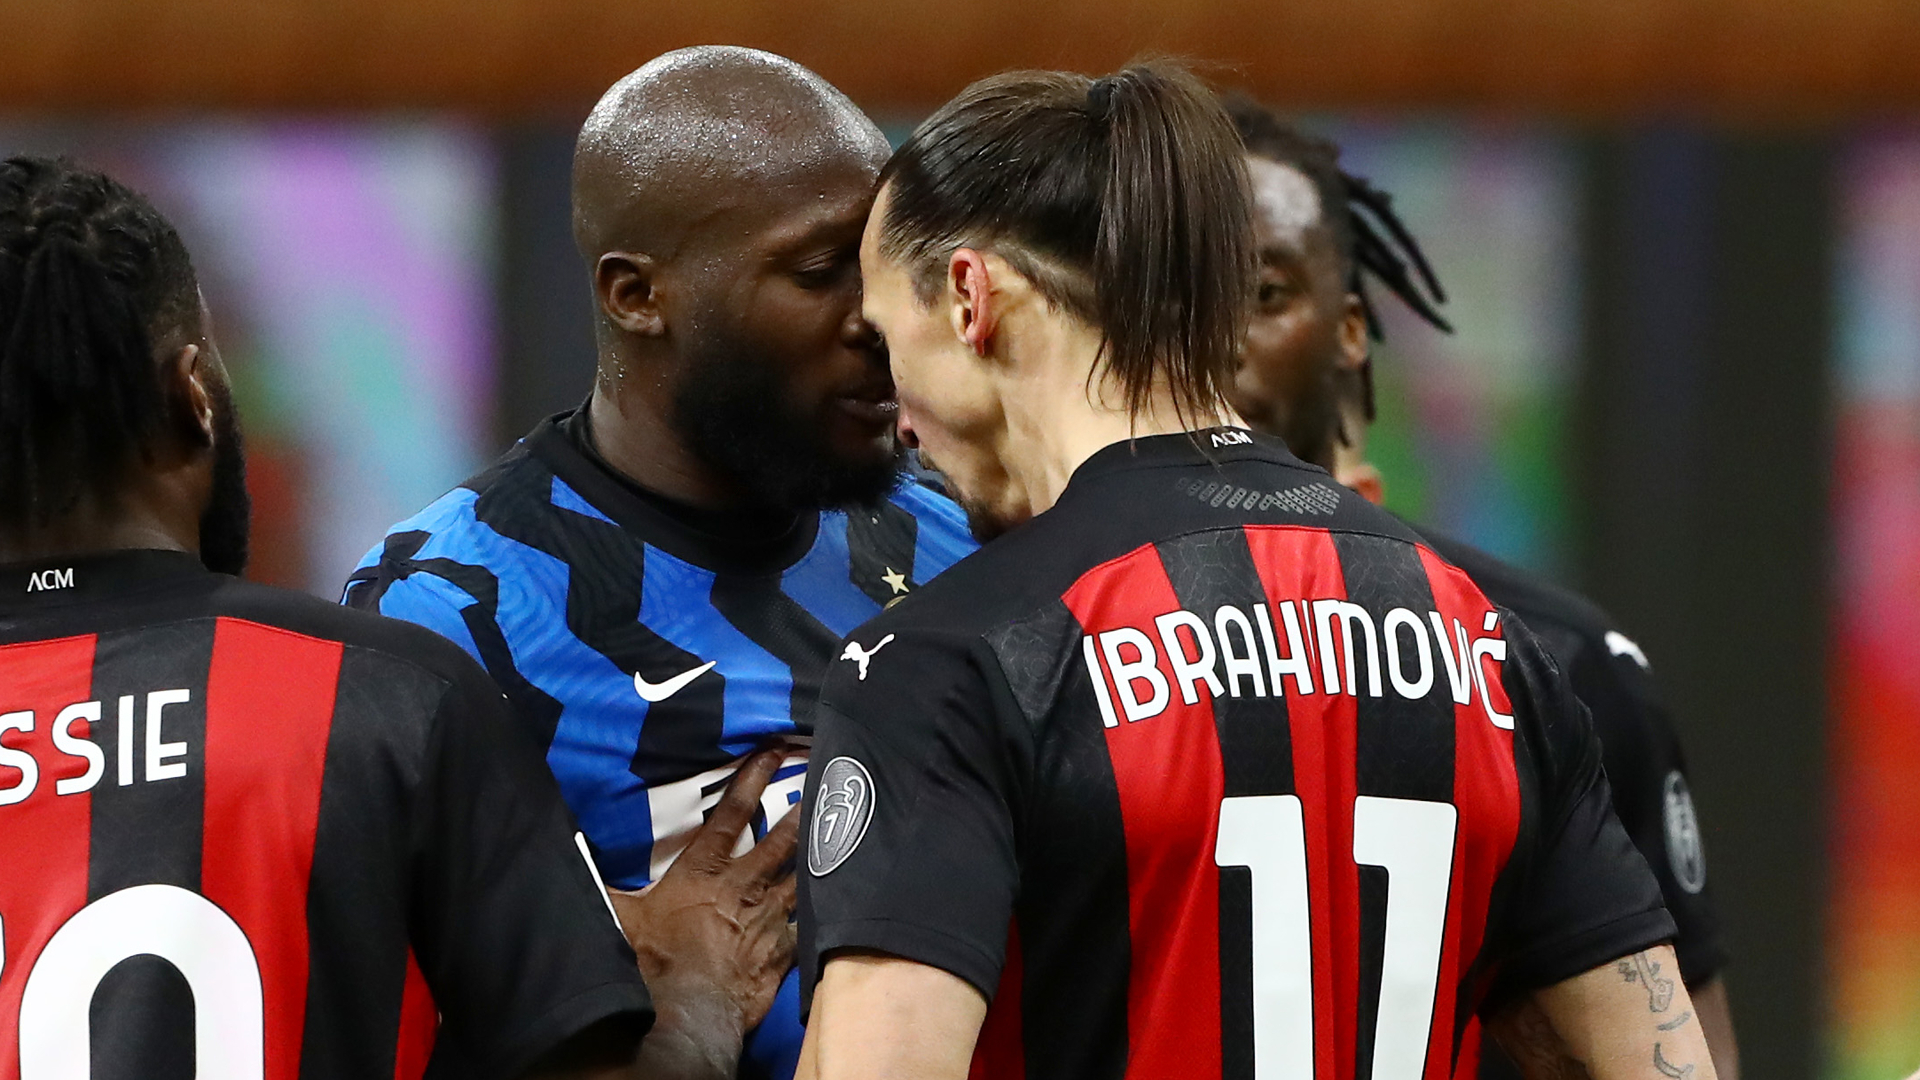 Ibrahimovic denies using racist language in on-field spat with Lukaku in  Inter vs AC Milan derby clash | Goal.com